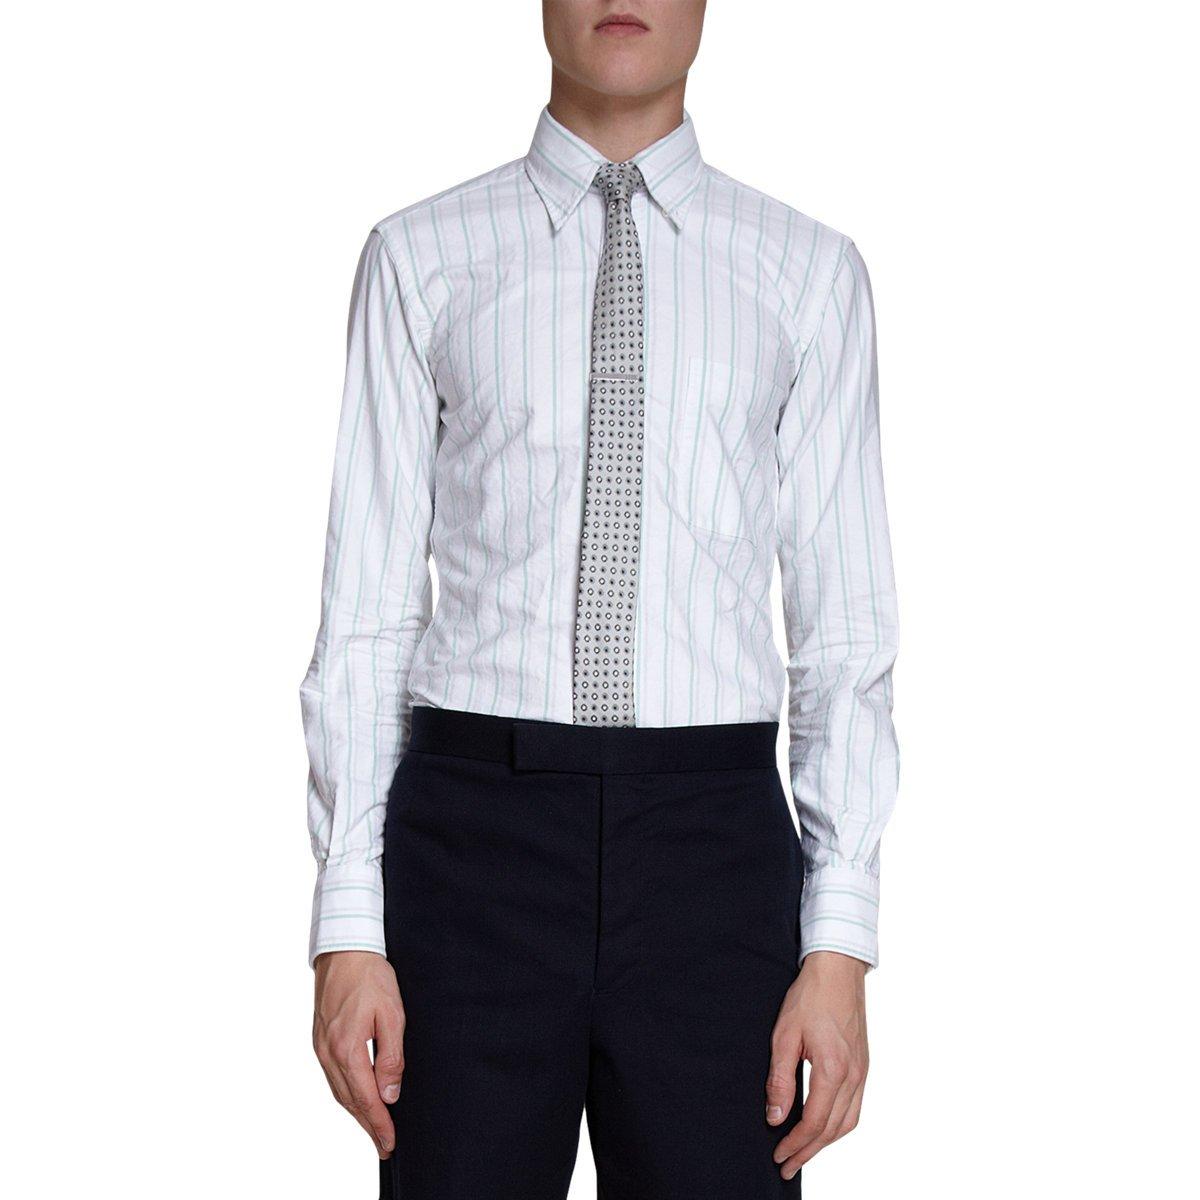 Thom browne oxford stripe dress shirt in white for men lyst for Thom browne white shirt